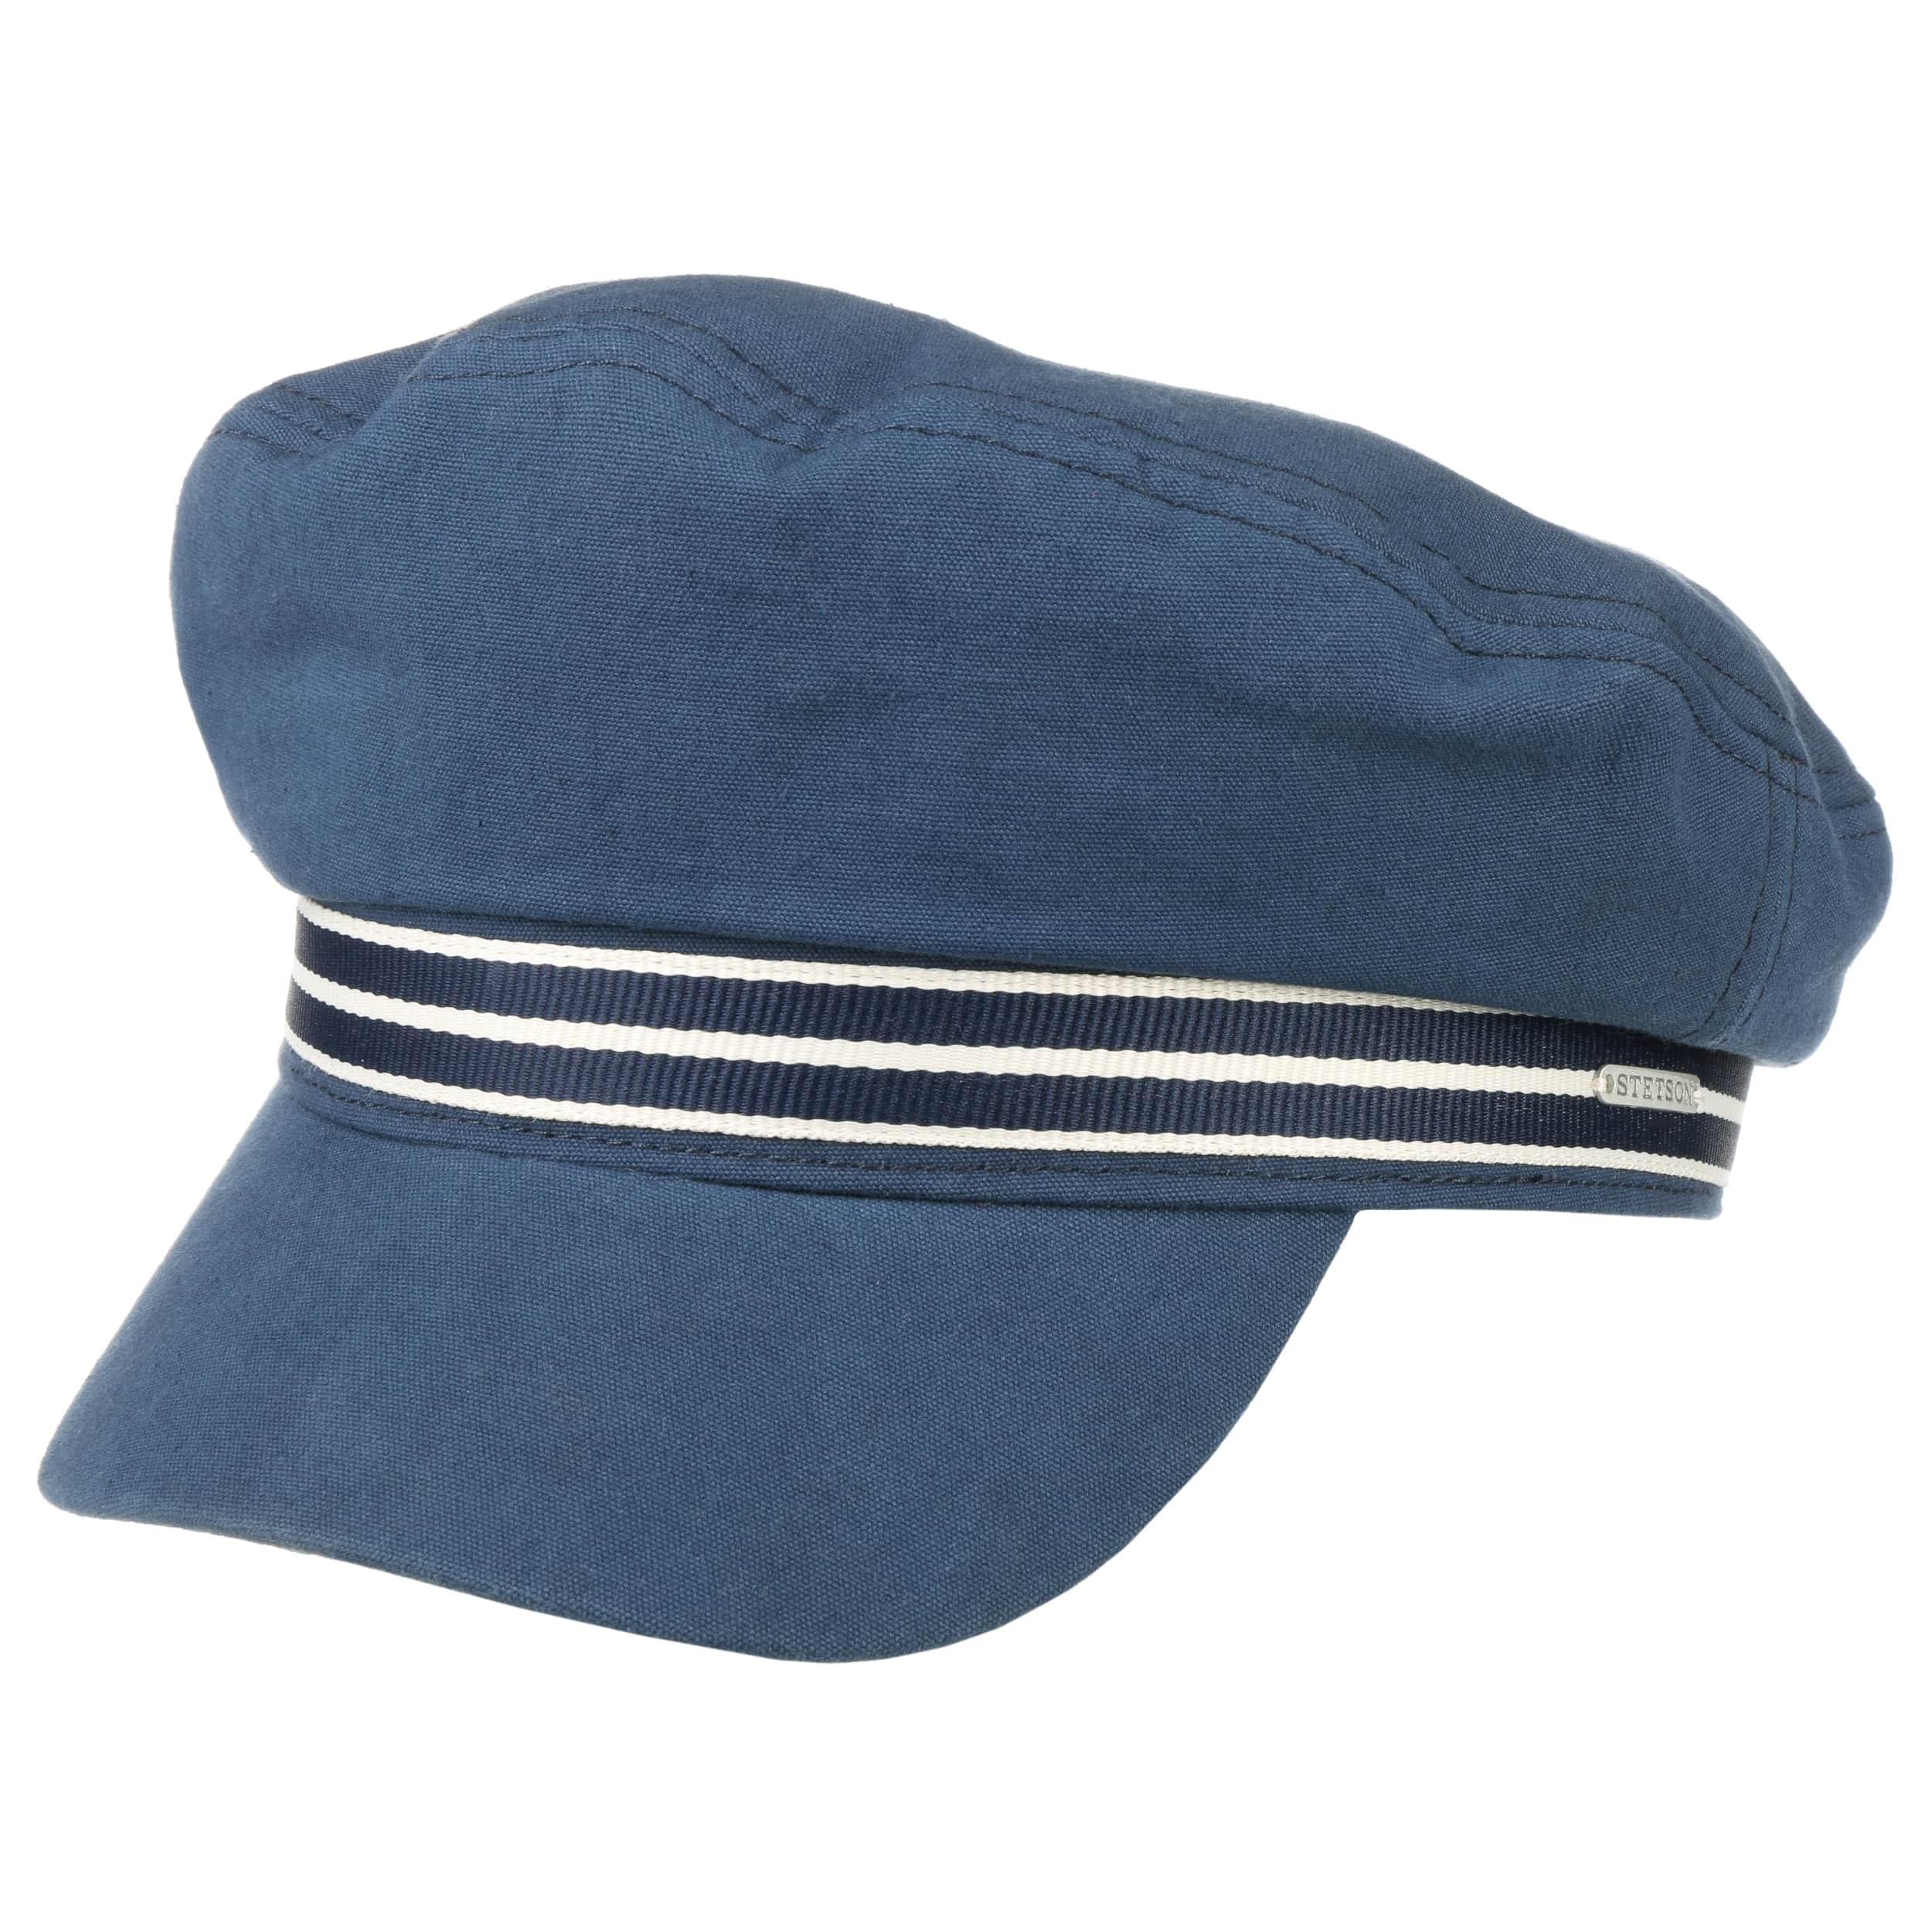 Gorra Marinera Canvas Fisherman by Stetson - Gorras - sombreroshop.es 31cf98b08d5